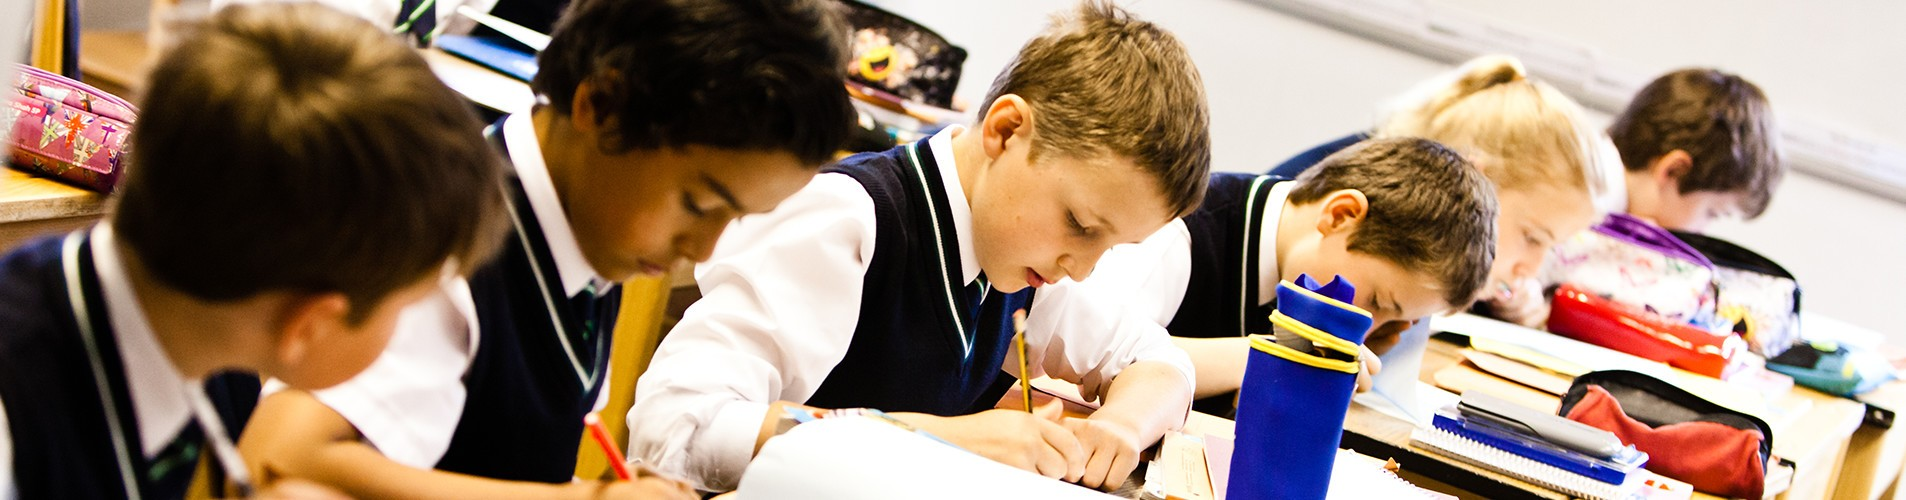 Curriculum at Highfield Prep School Harrogate